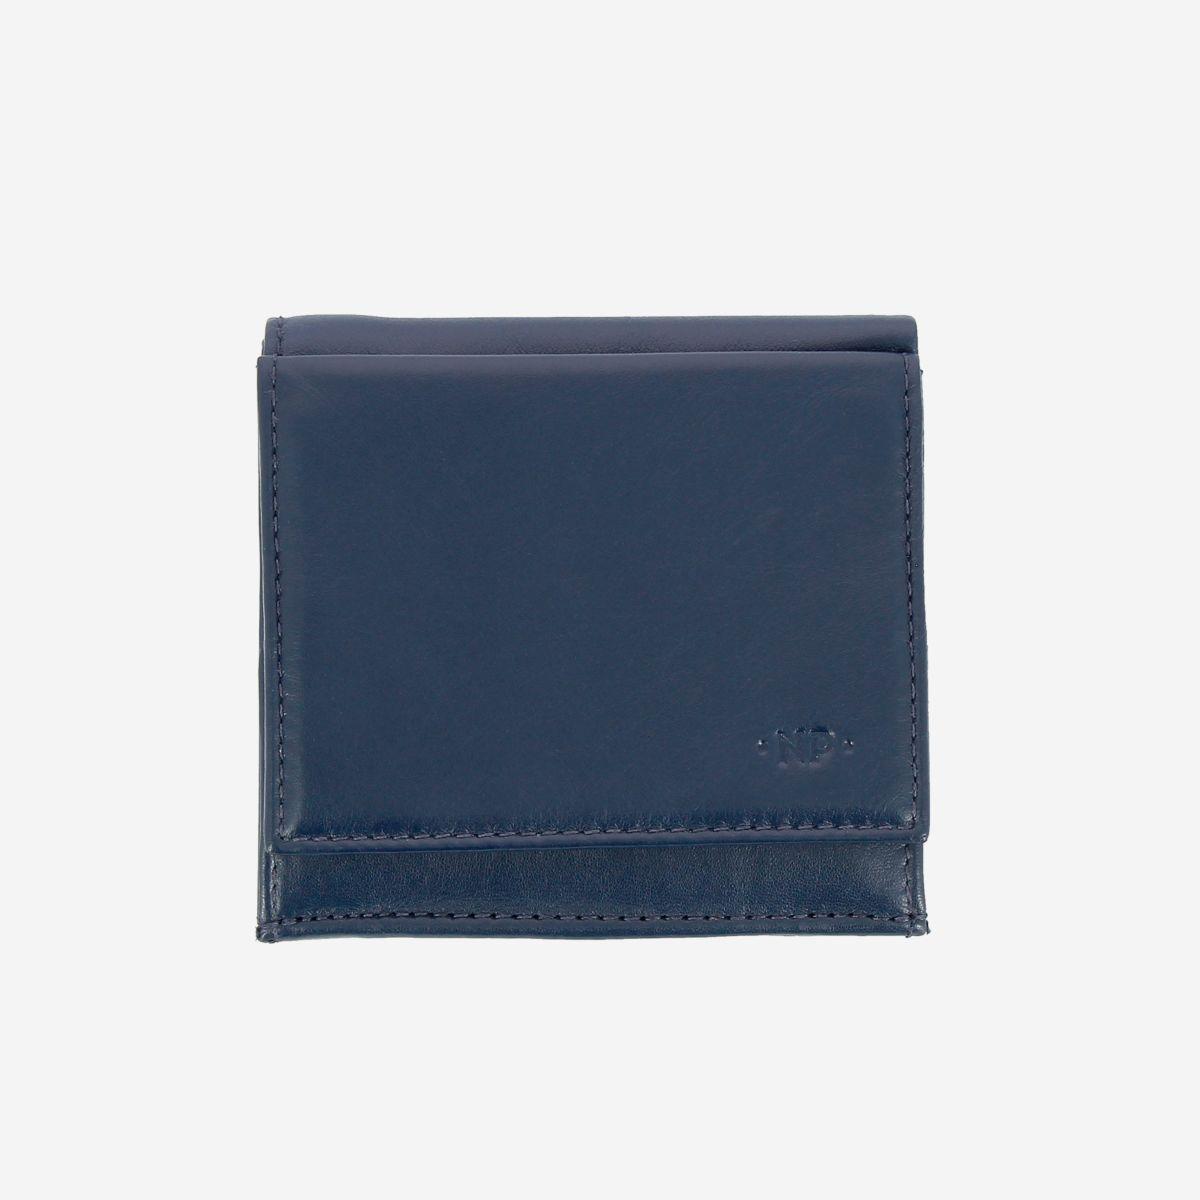 NUVOLA PELLE ארנק עור עם תא ייחודי למטבעות - כחול